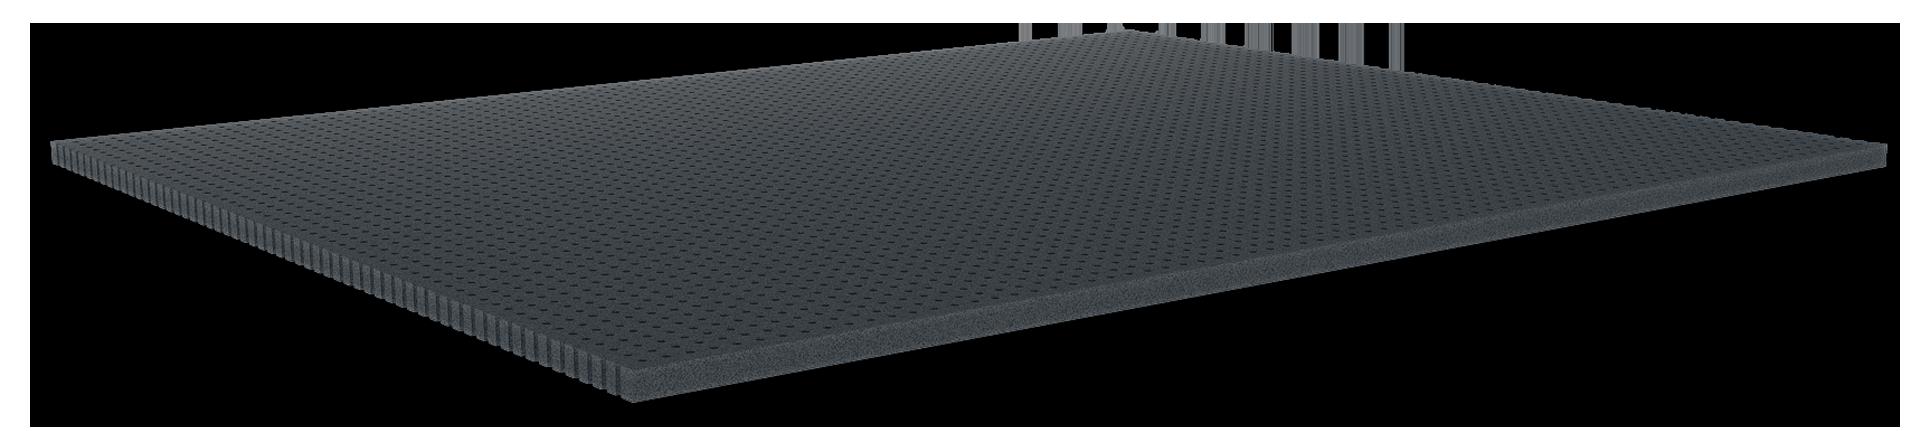 Mattress Layer 2 - Graphite-Infused Latex